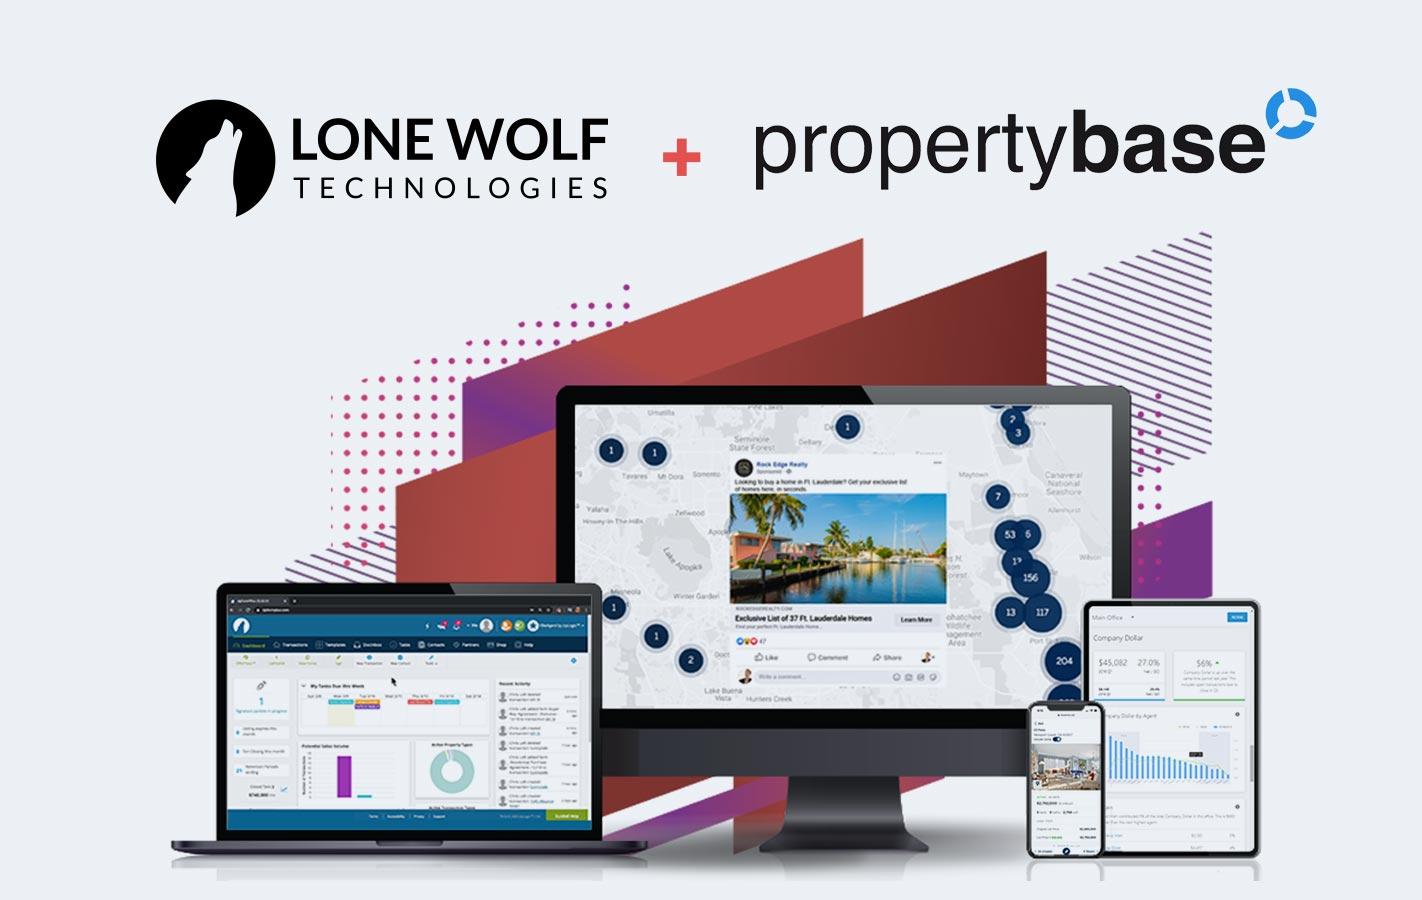 Lonewolf property base